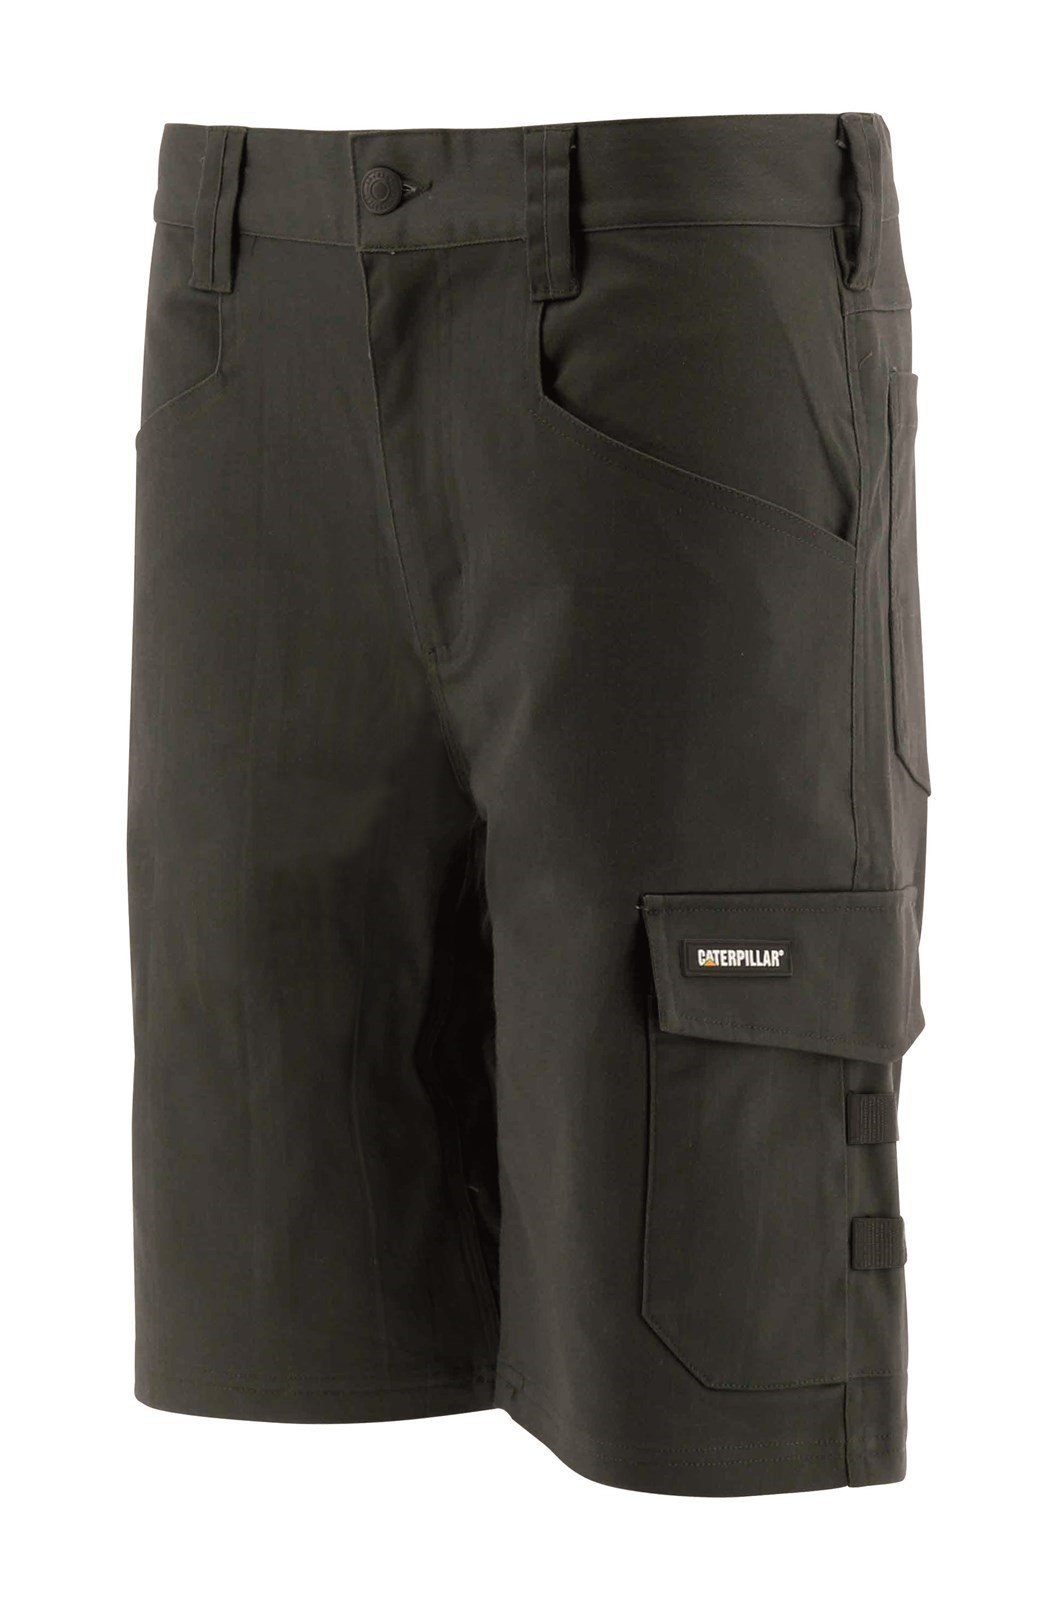 "Caterpillar Unisex Tracker Shorts Black 32224 - Black 30"""